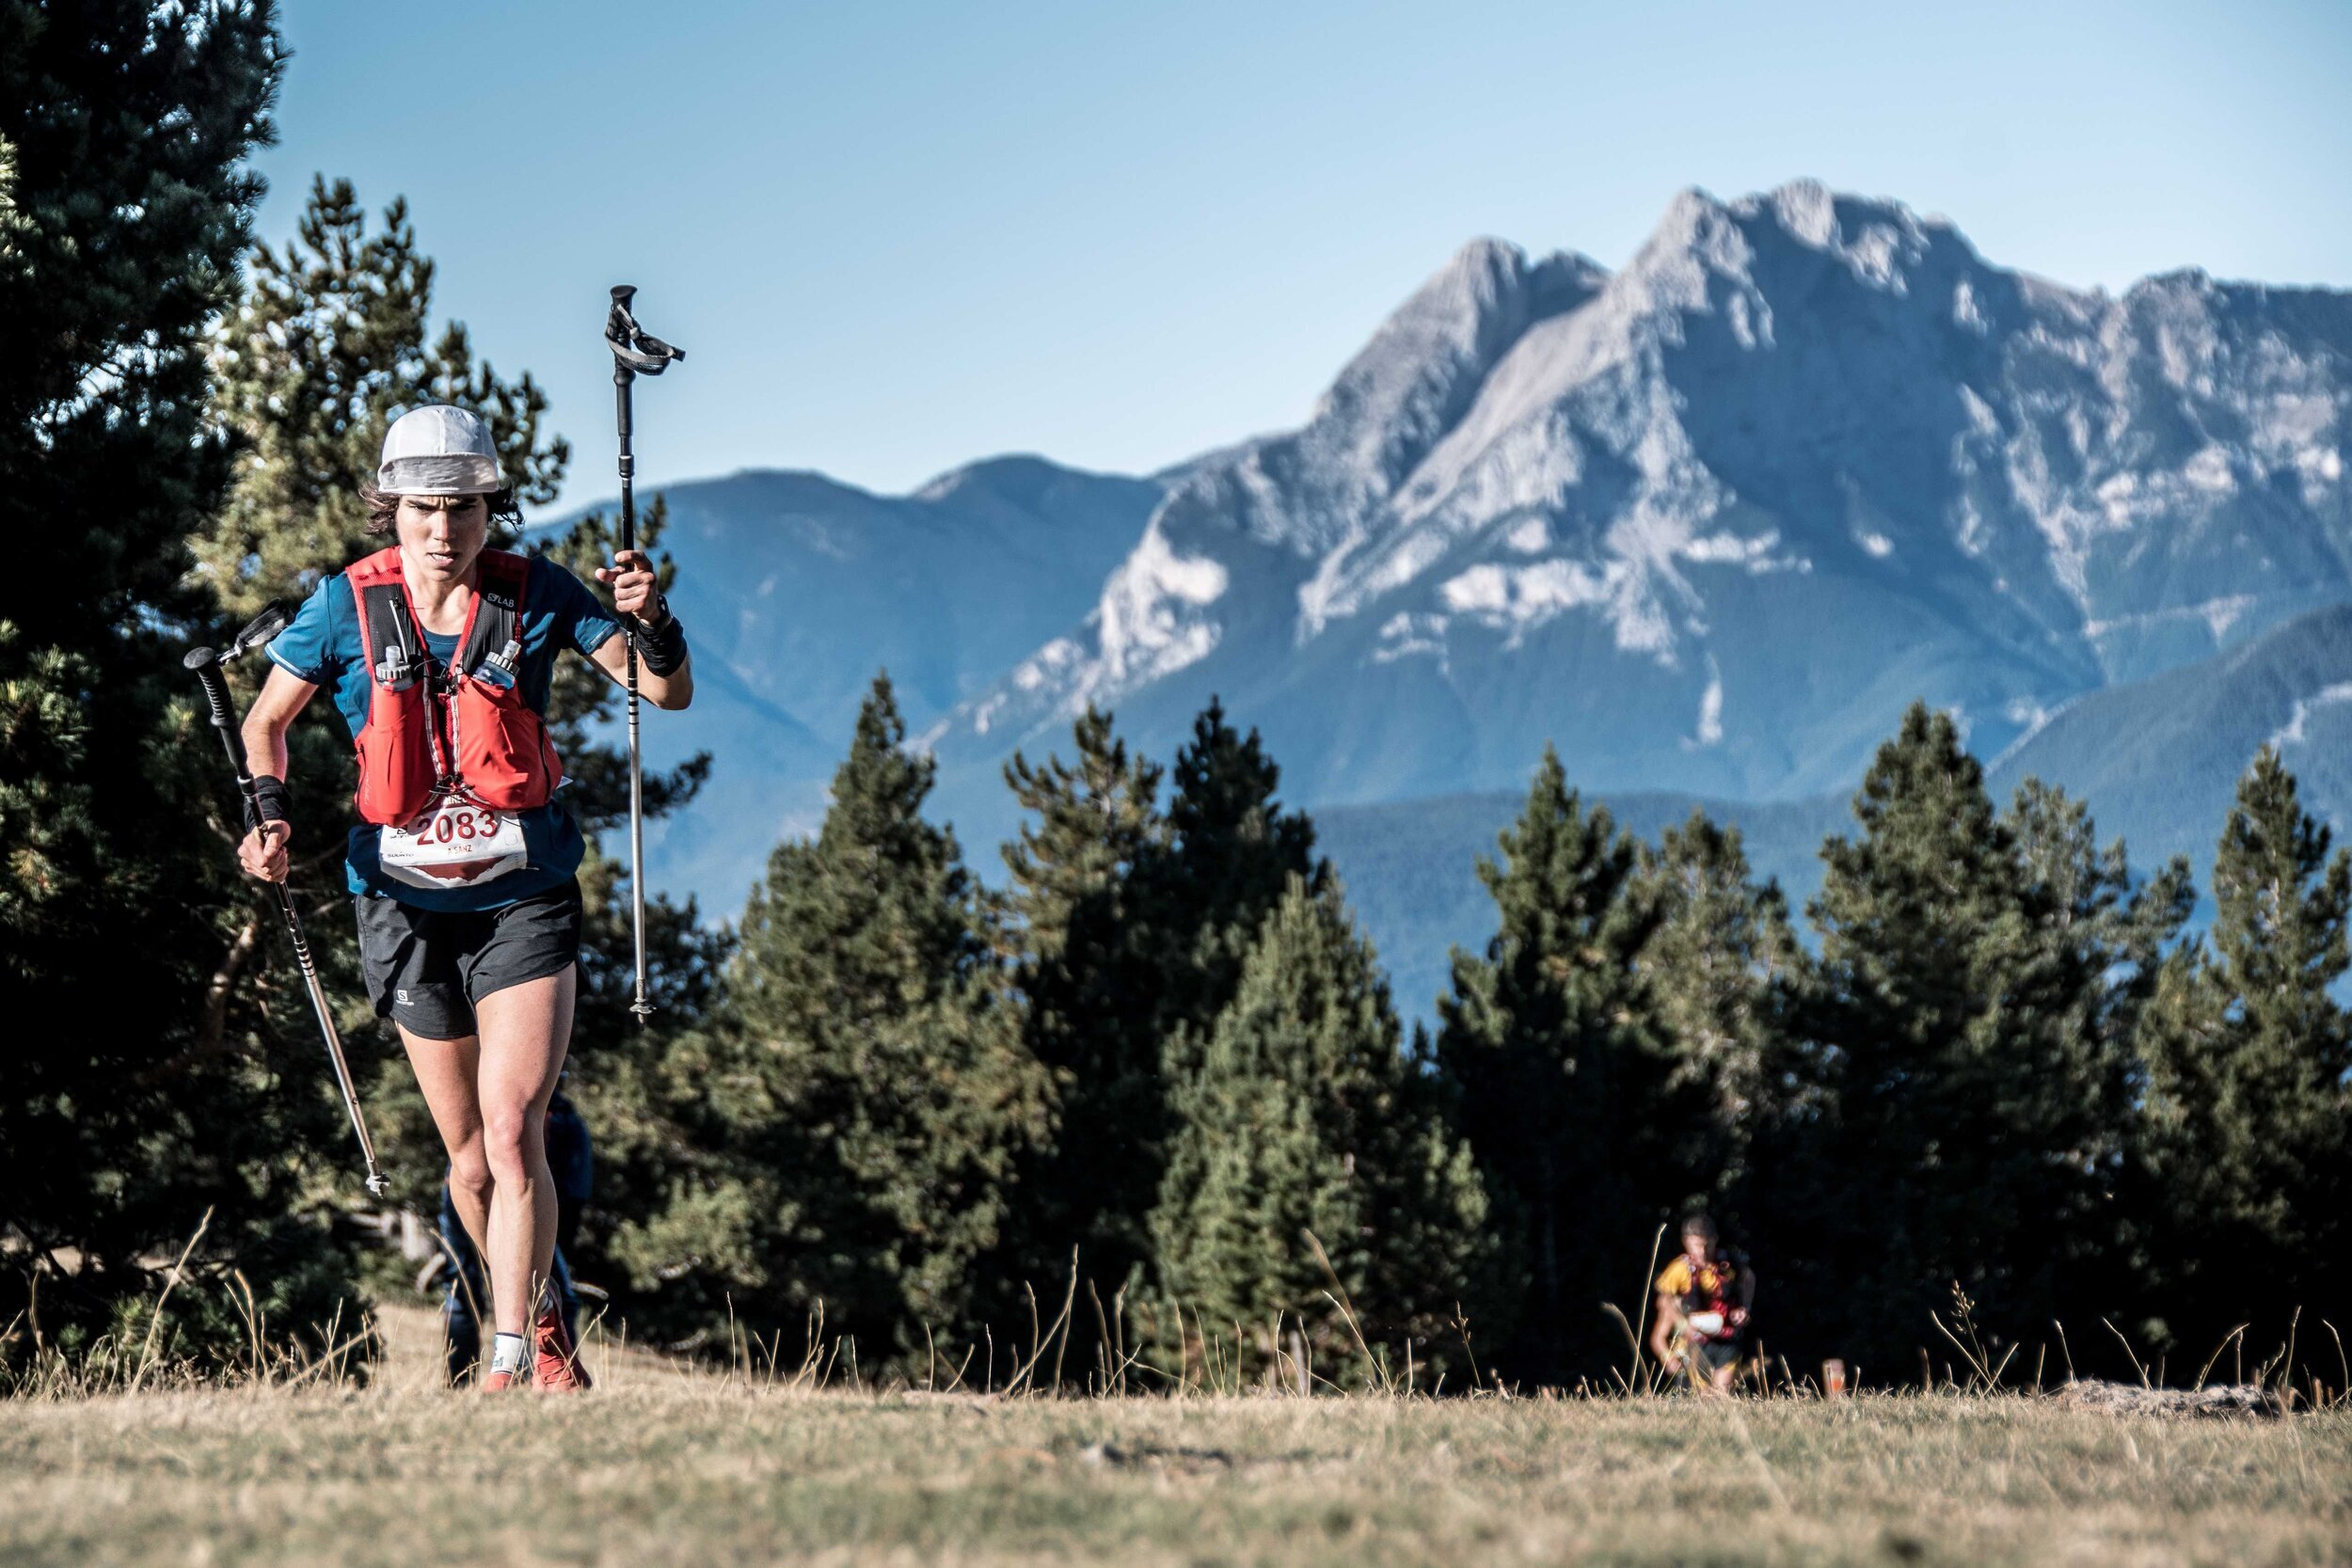 Ainhoa Sanz on her way to victory at Sky Pirineu. Photo by: Roger Salanova